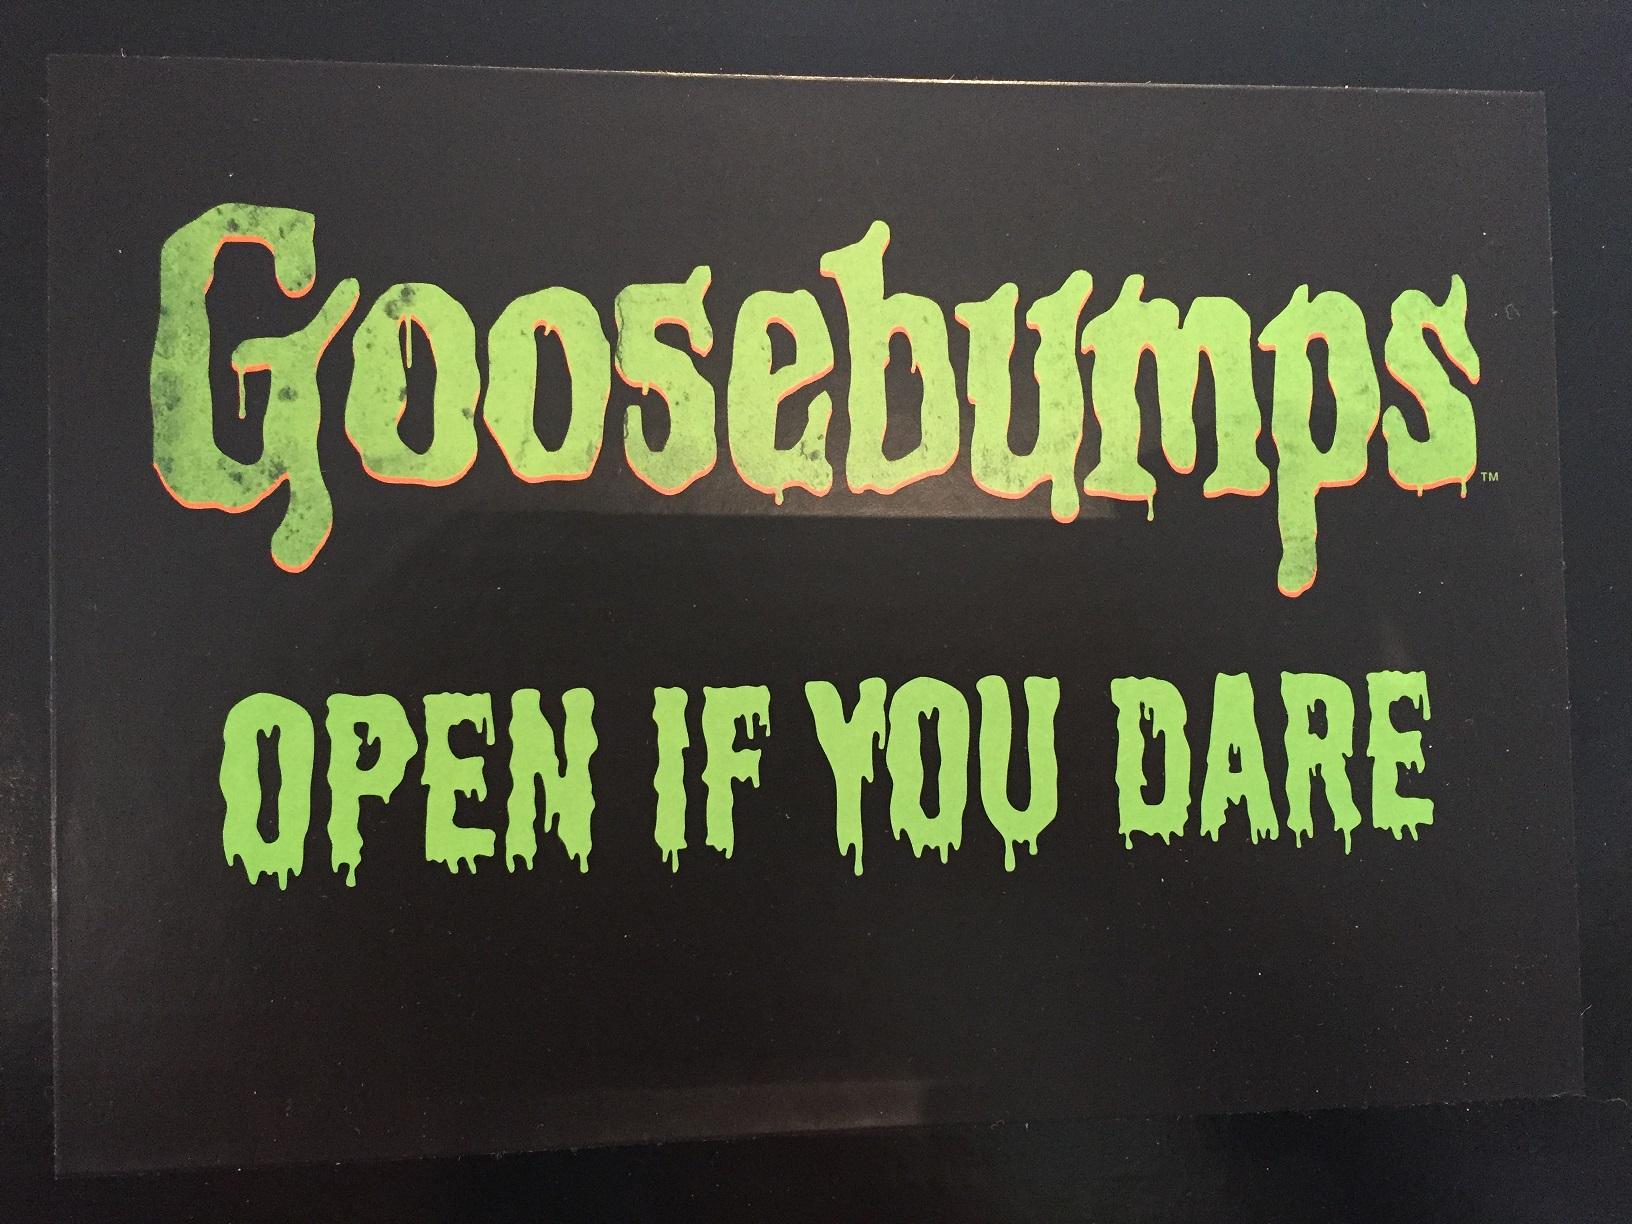 Goosebumps the movie – starring Jack Black